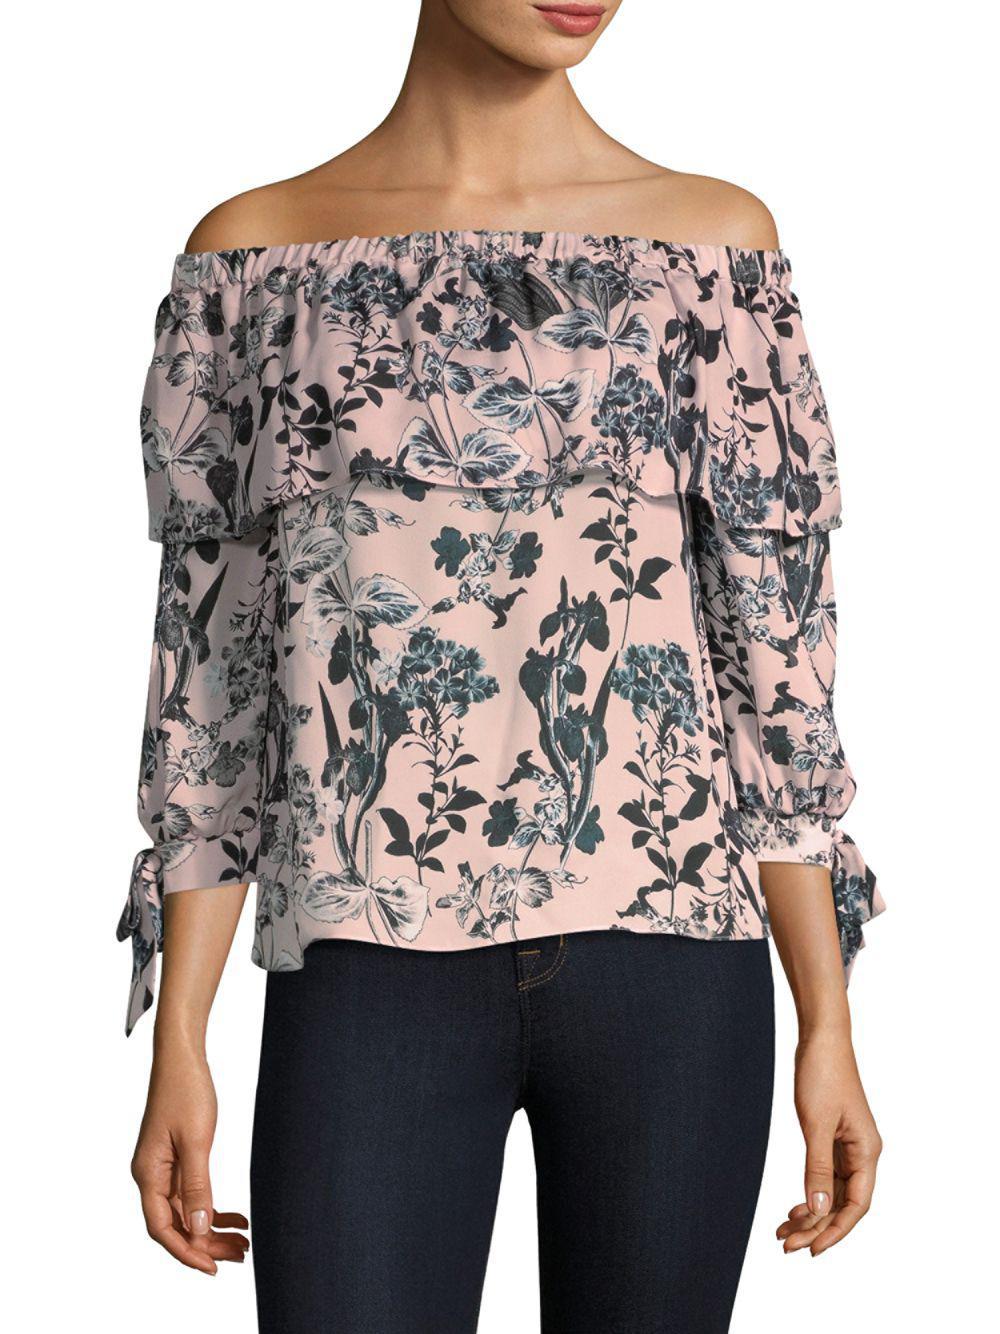 a15dc0541ea70 Lyst - Parker Mandy Off-the-shoulder Silk Top - Save 63%